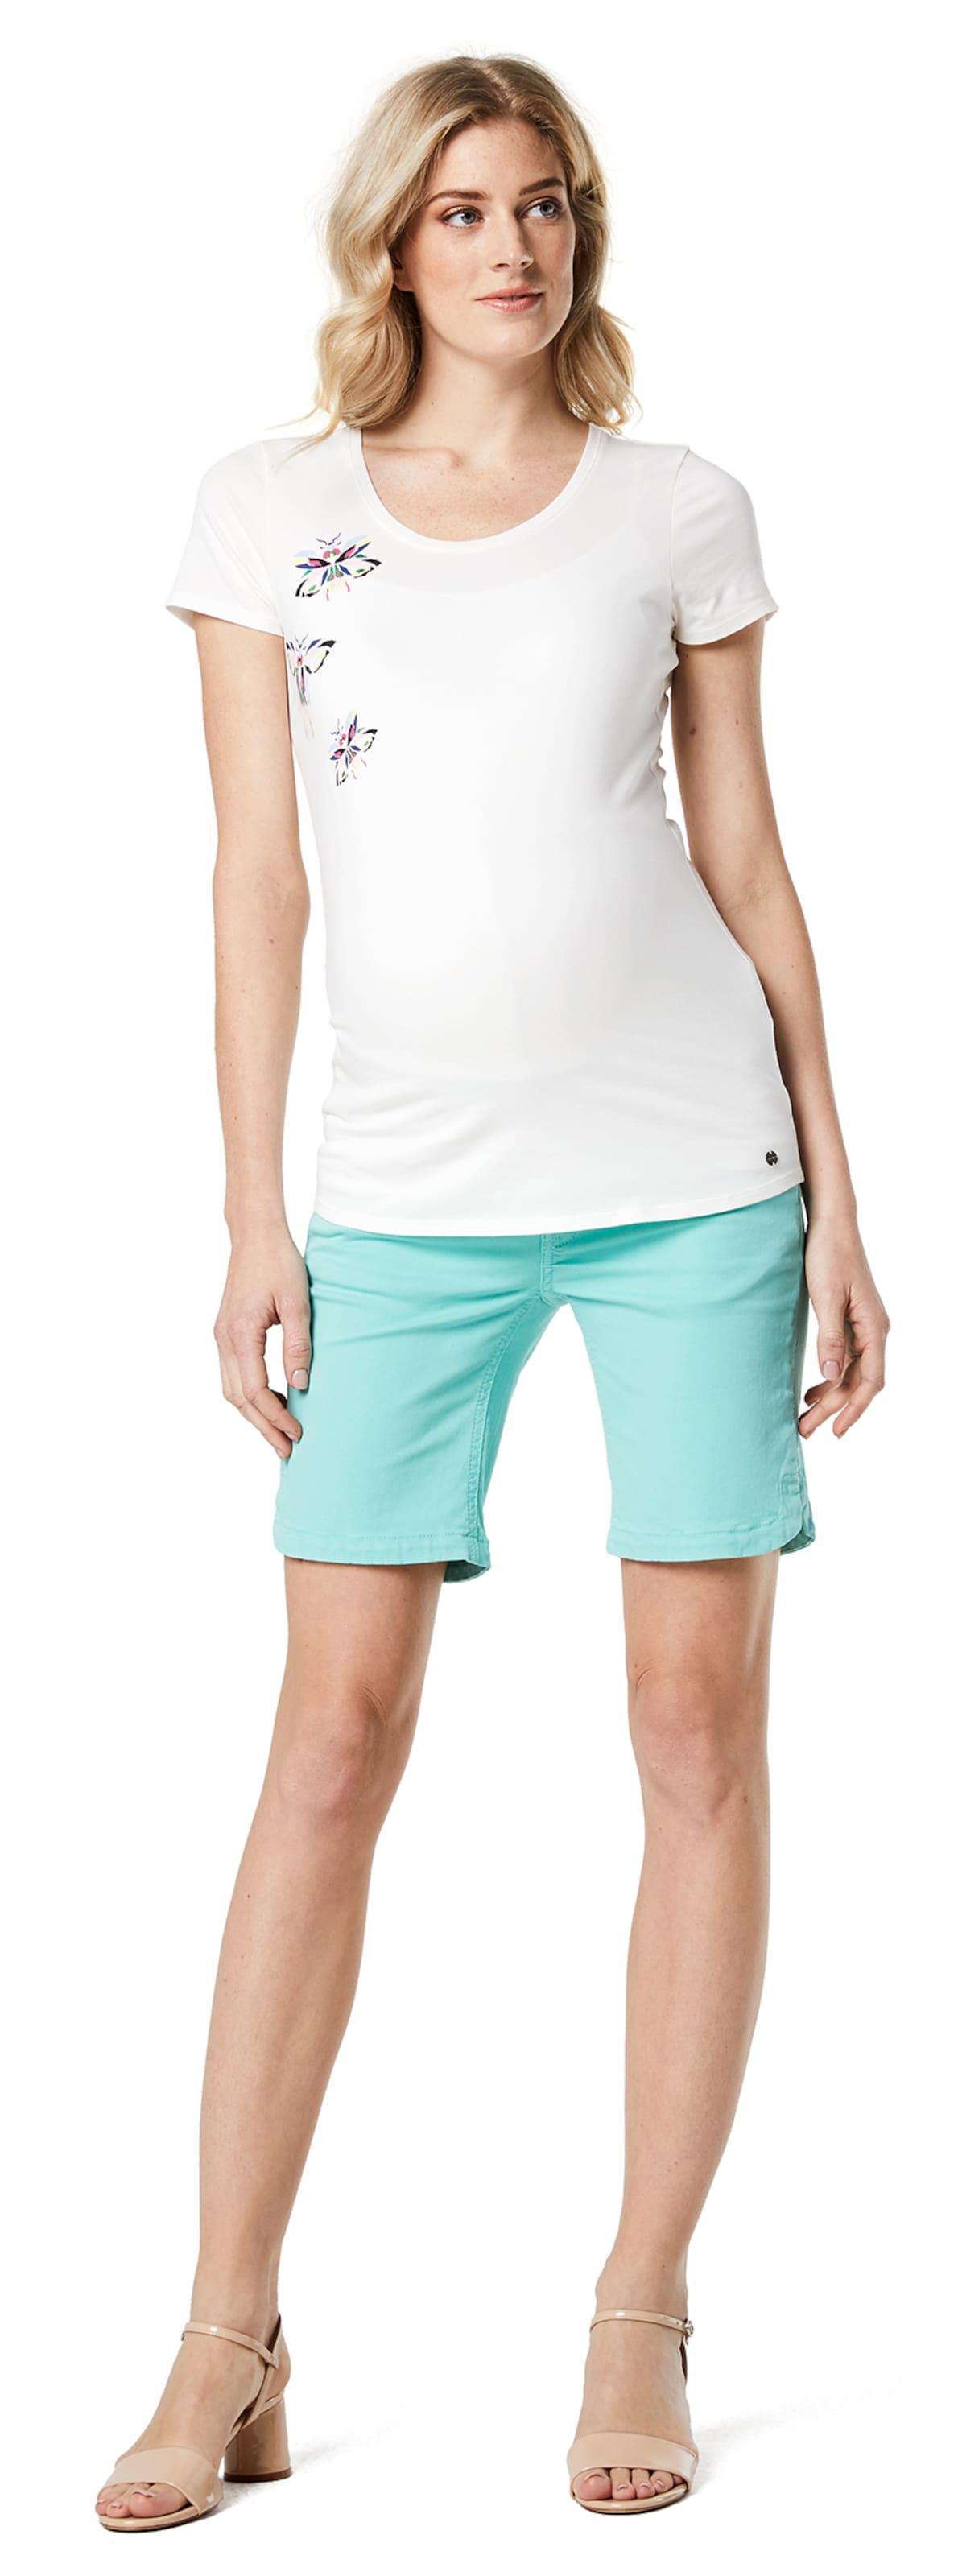 Shirt Natuurwit Maternity Esprit Shirt In Esprit Maternity HW2ebDIYE9